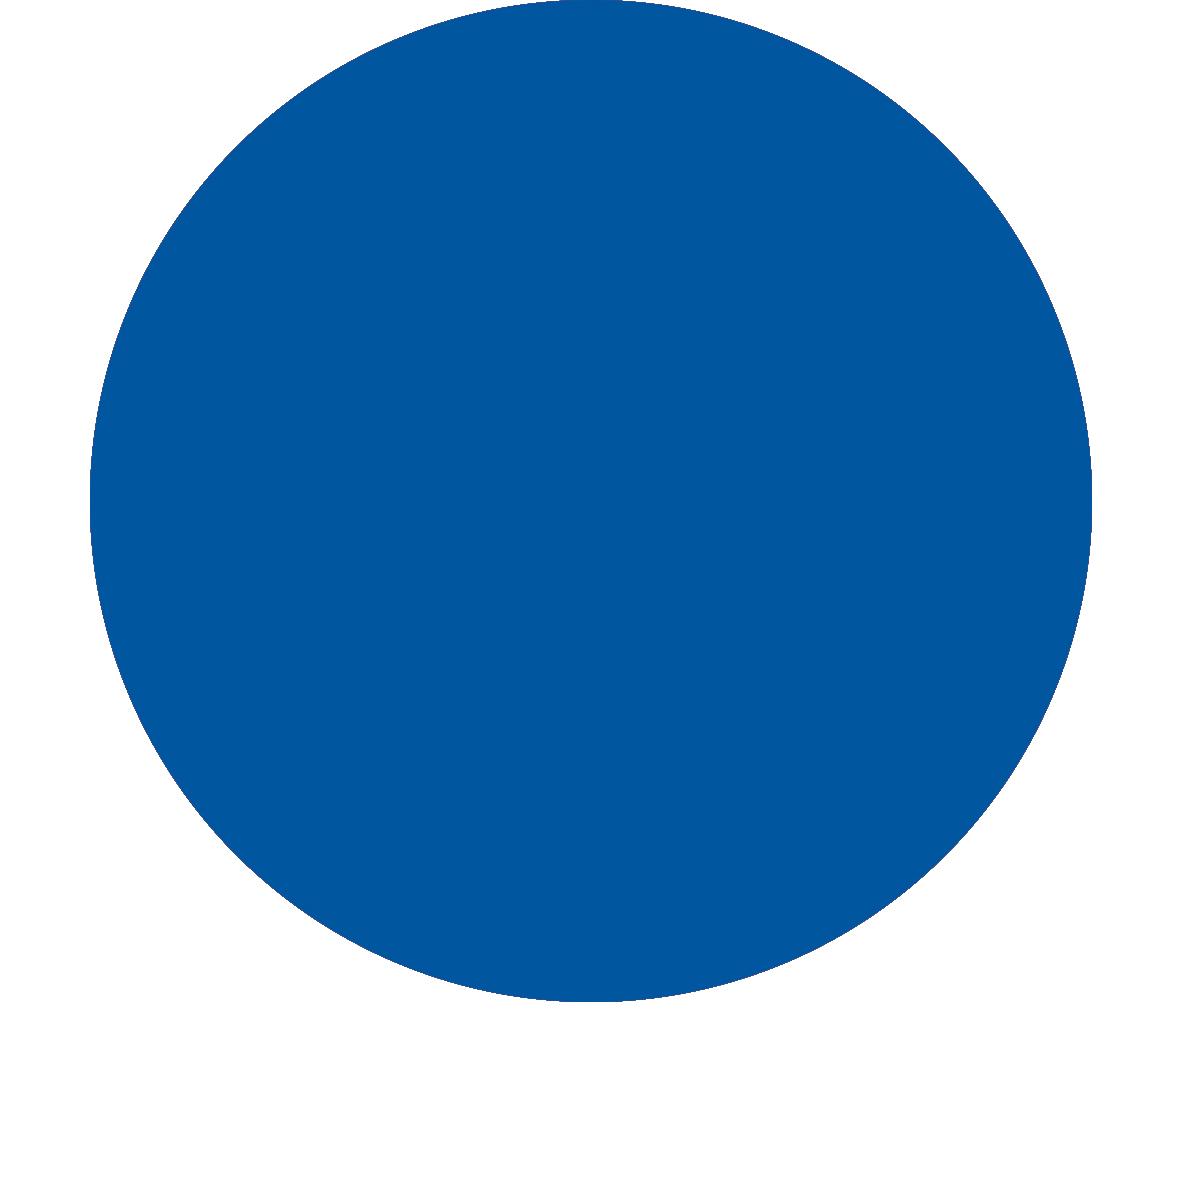 C.I. Blue 15.1(UNL5151) -